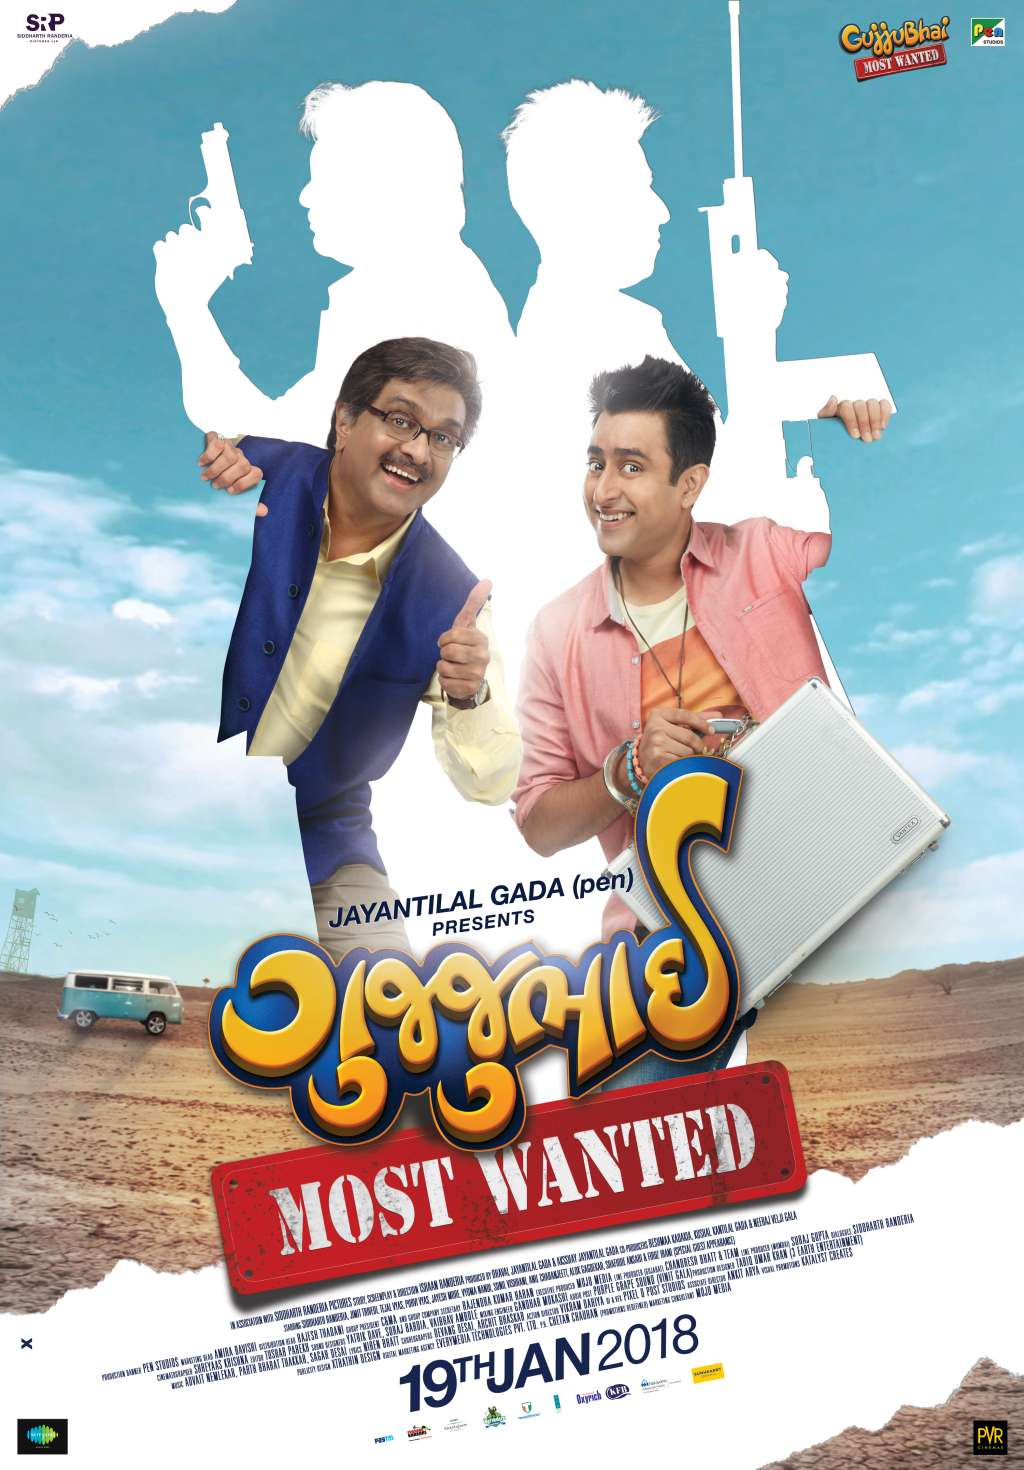 GujjuBhai - Most Wanted kapak